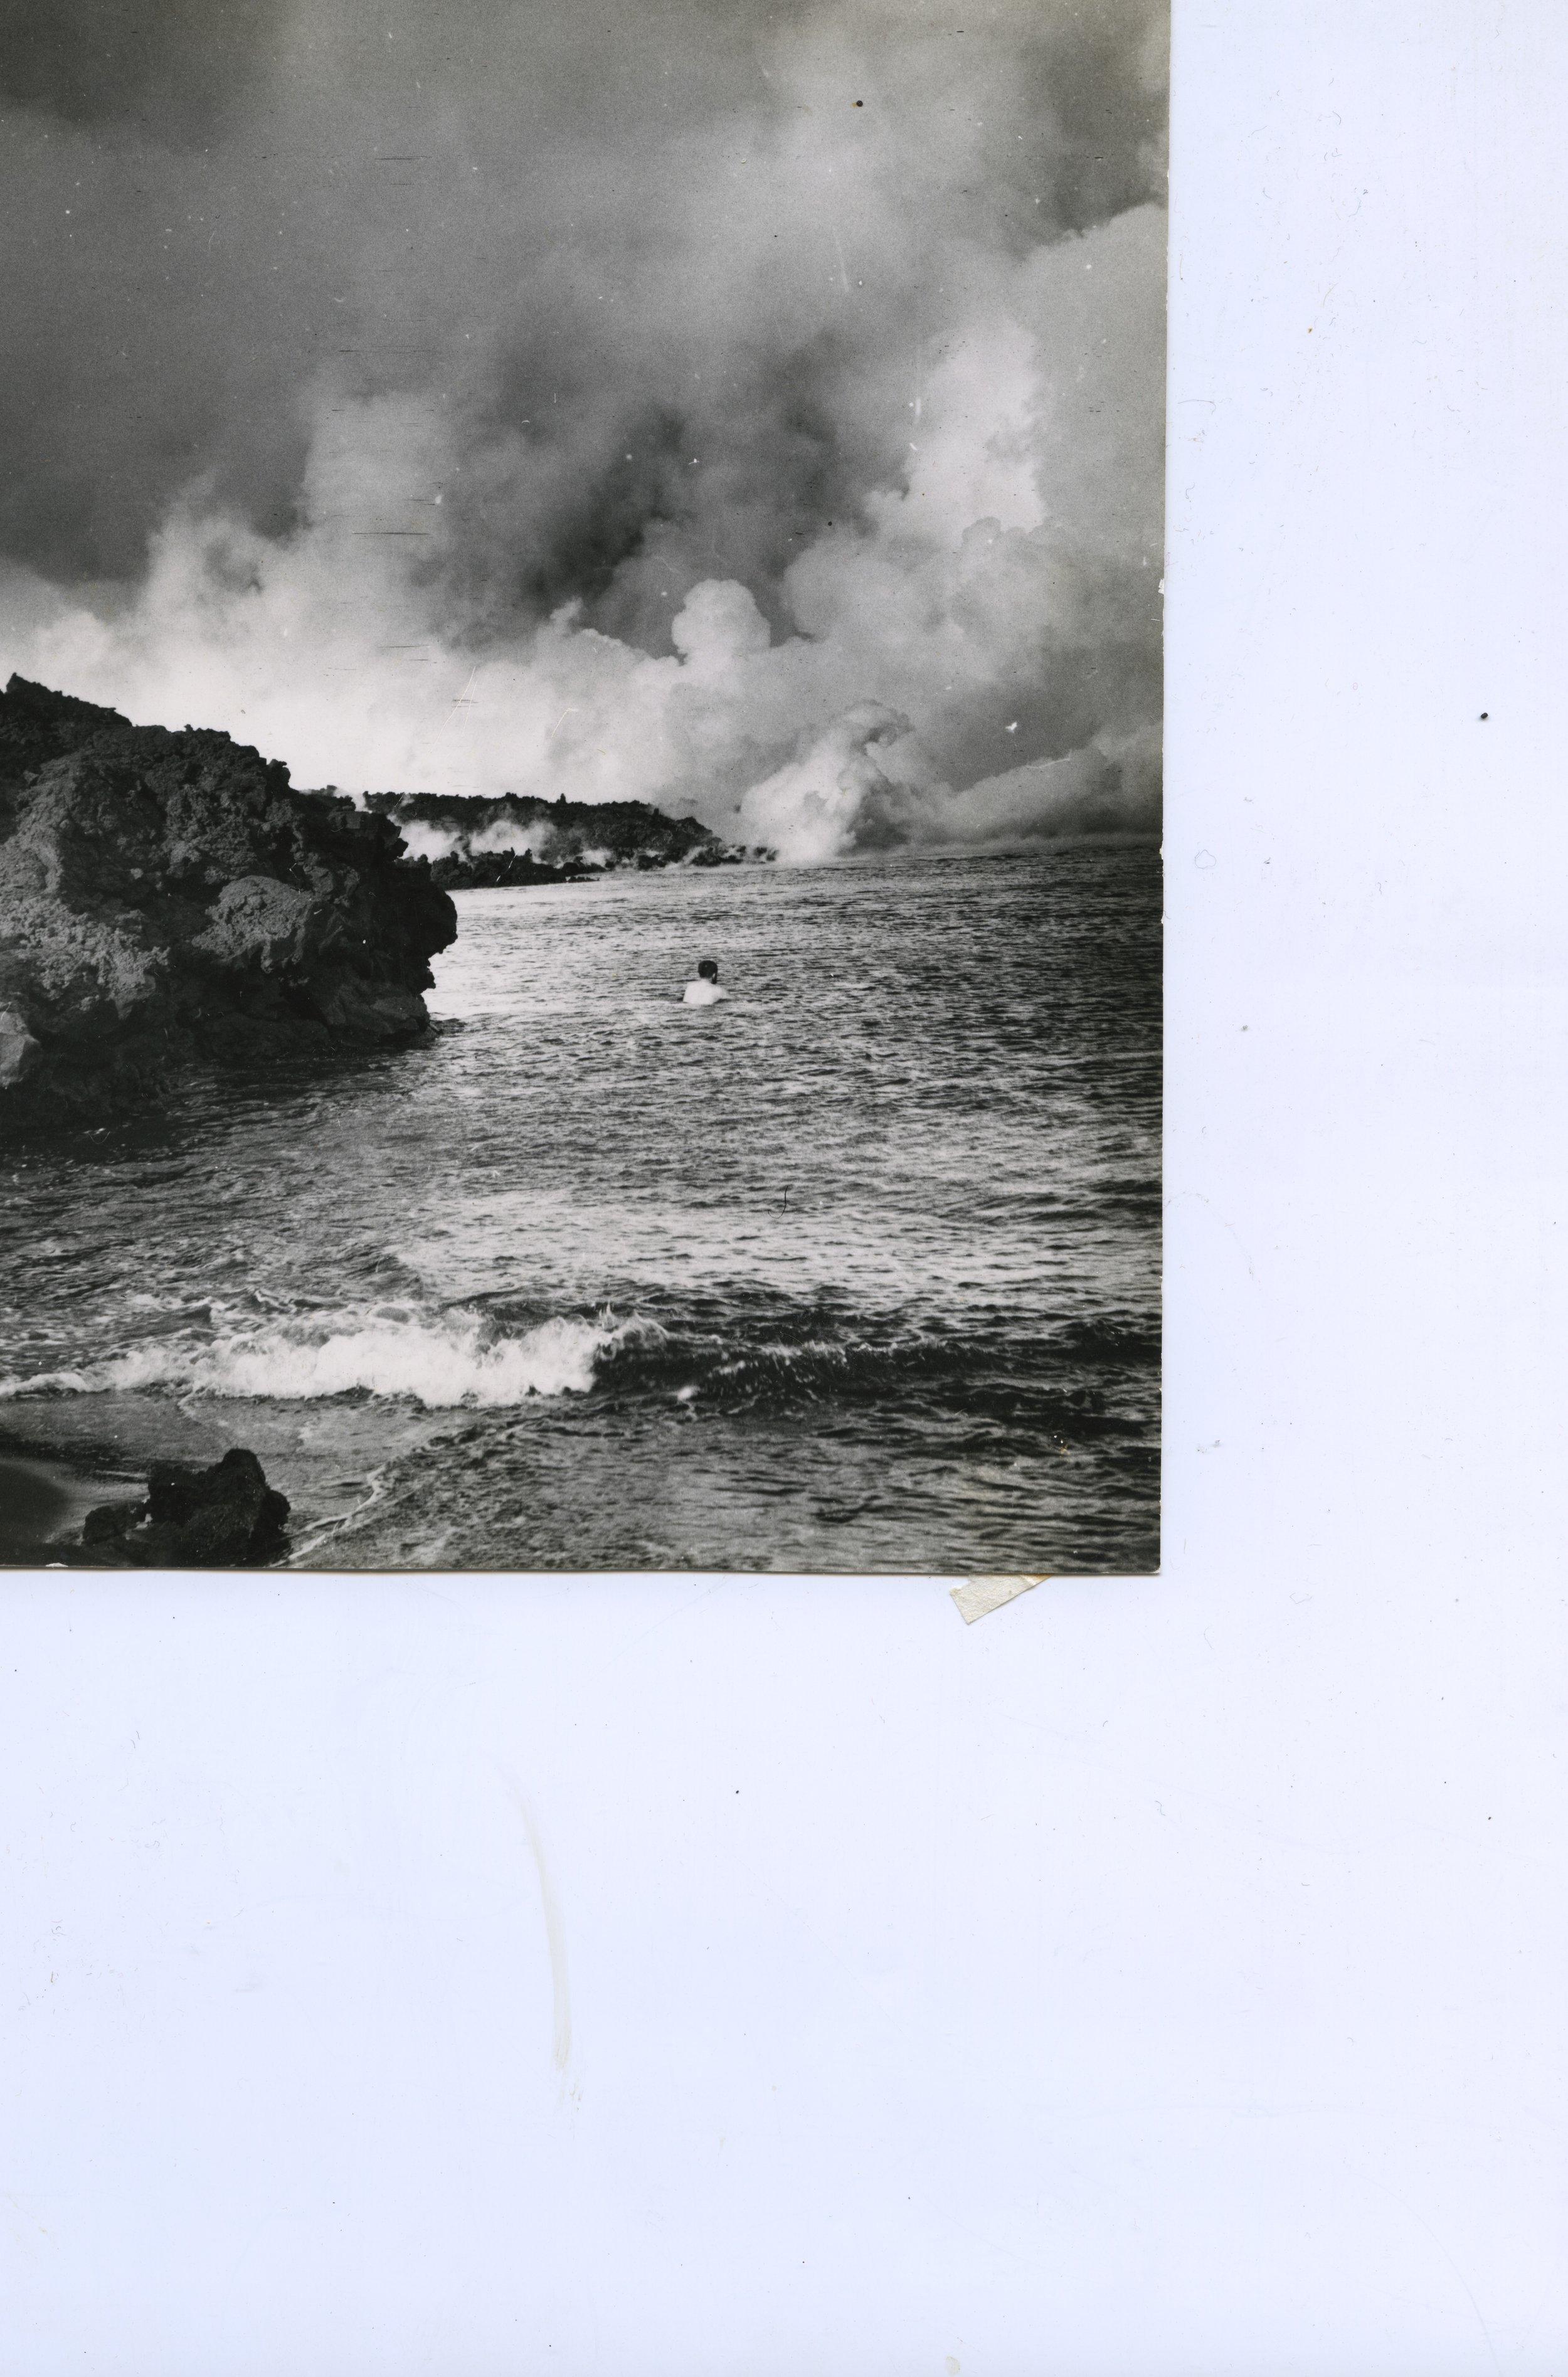 stursay eruption photog swimming chp 8 subaqueous .jpeg